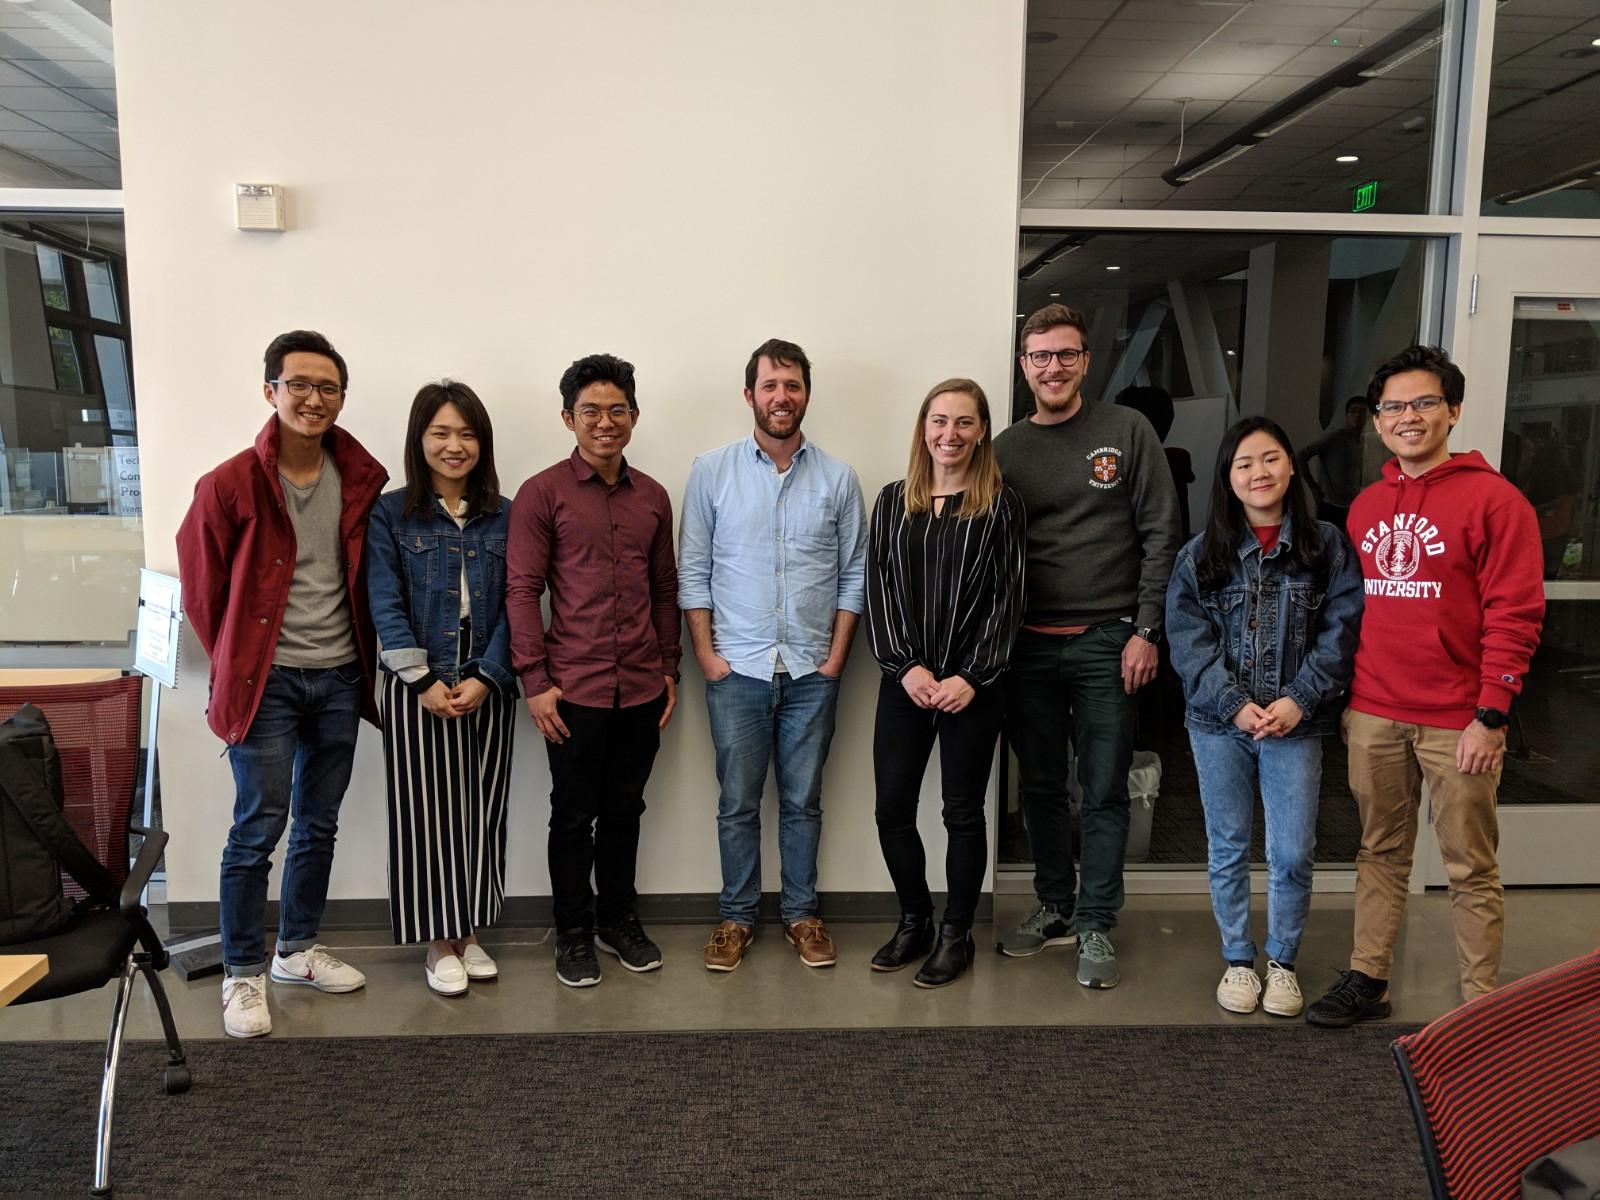 Post-hack photo! - Lee Yan Hui, Travis Tang Voon Hao, Frankie Ye Htet Myat, Evangeline Ng and Google Judge Panels: Andrew Peterman and Kendal Smith